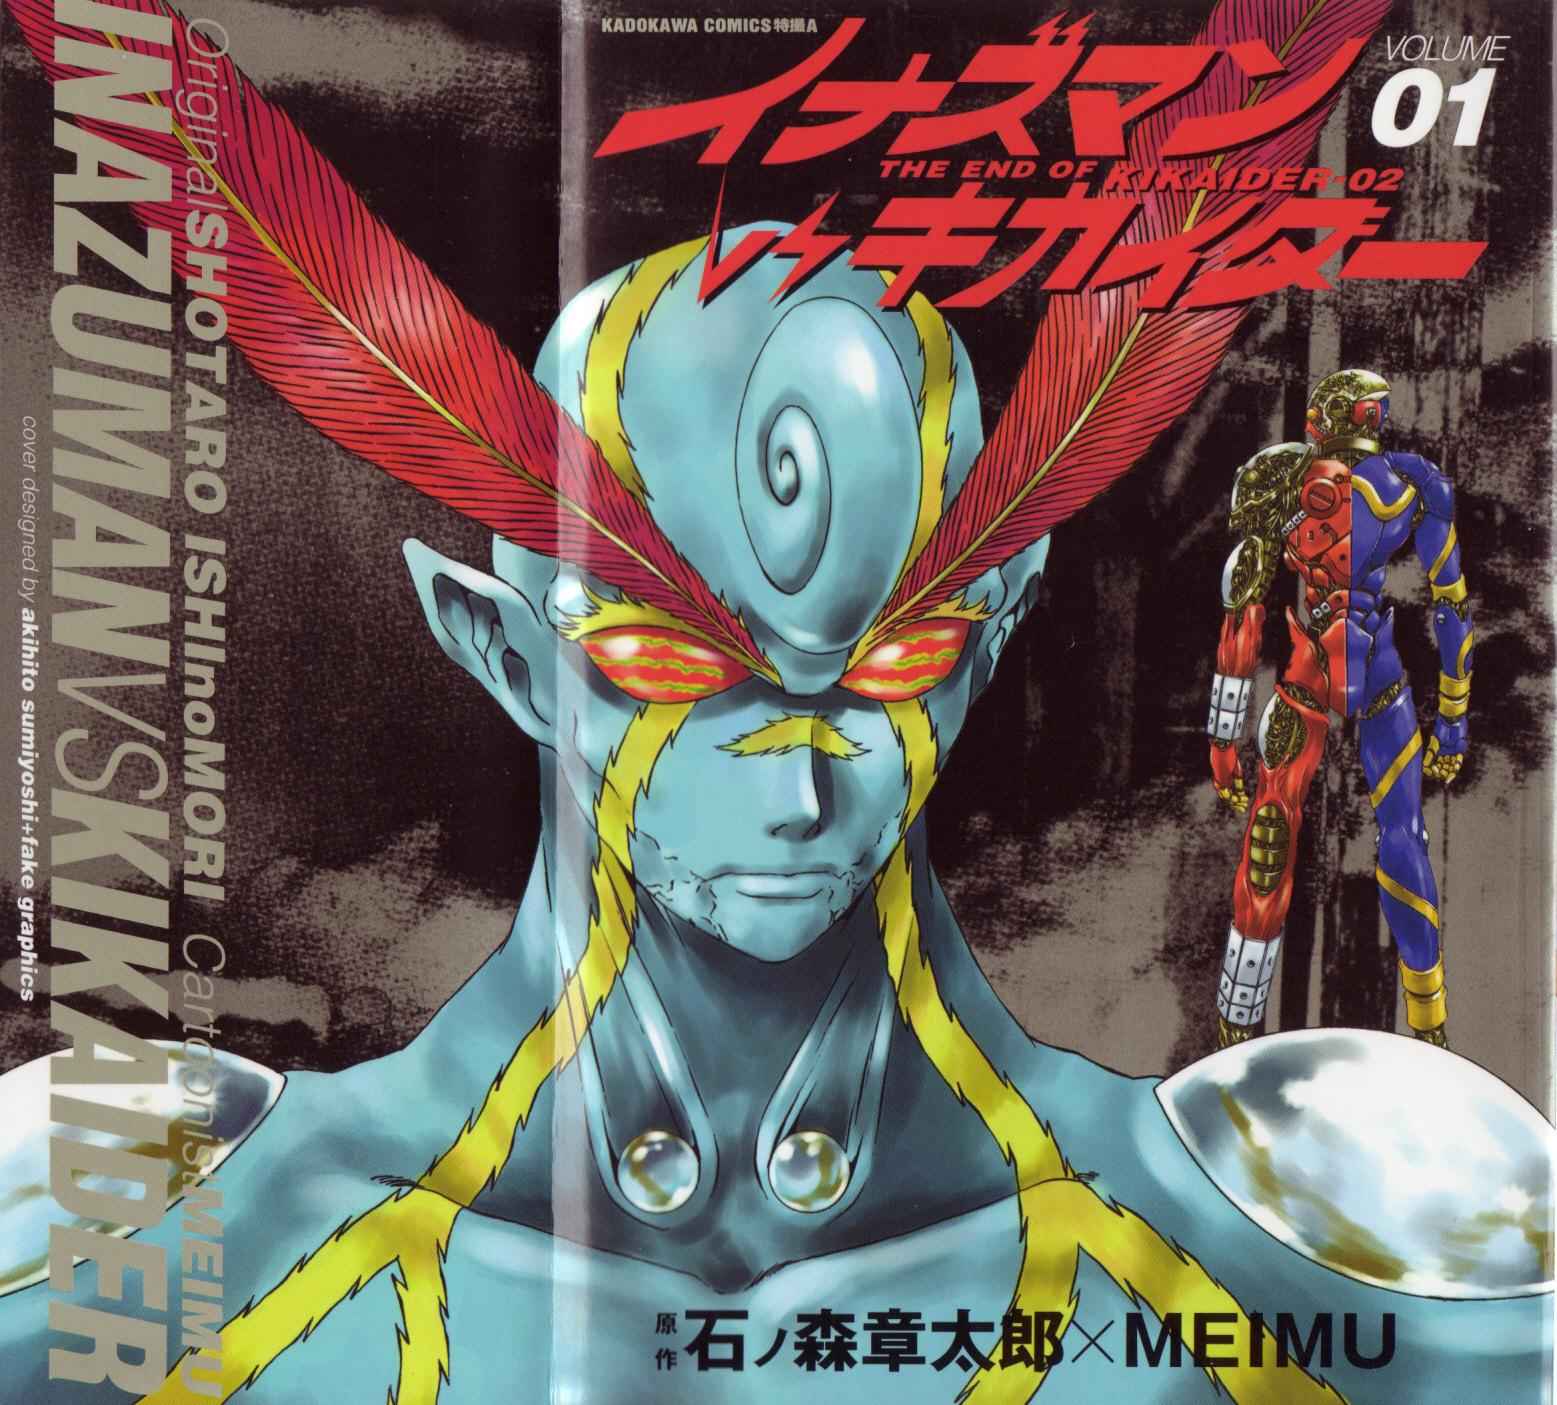 The X Database: Kamen Rider X Kamen Rider Wizard Fourze